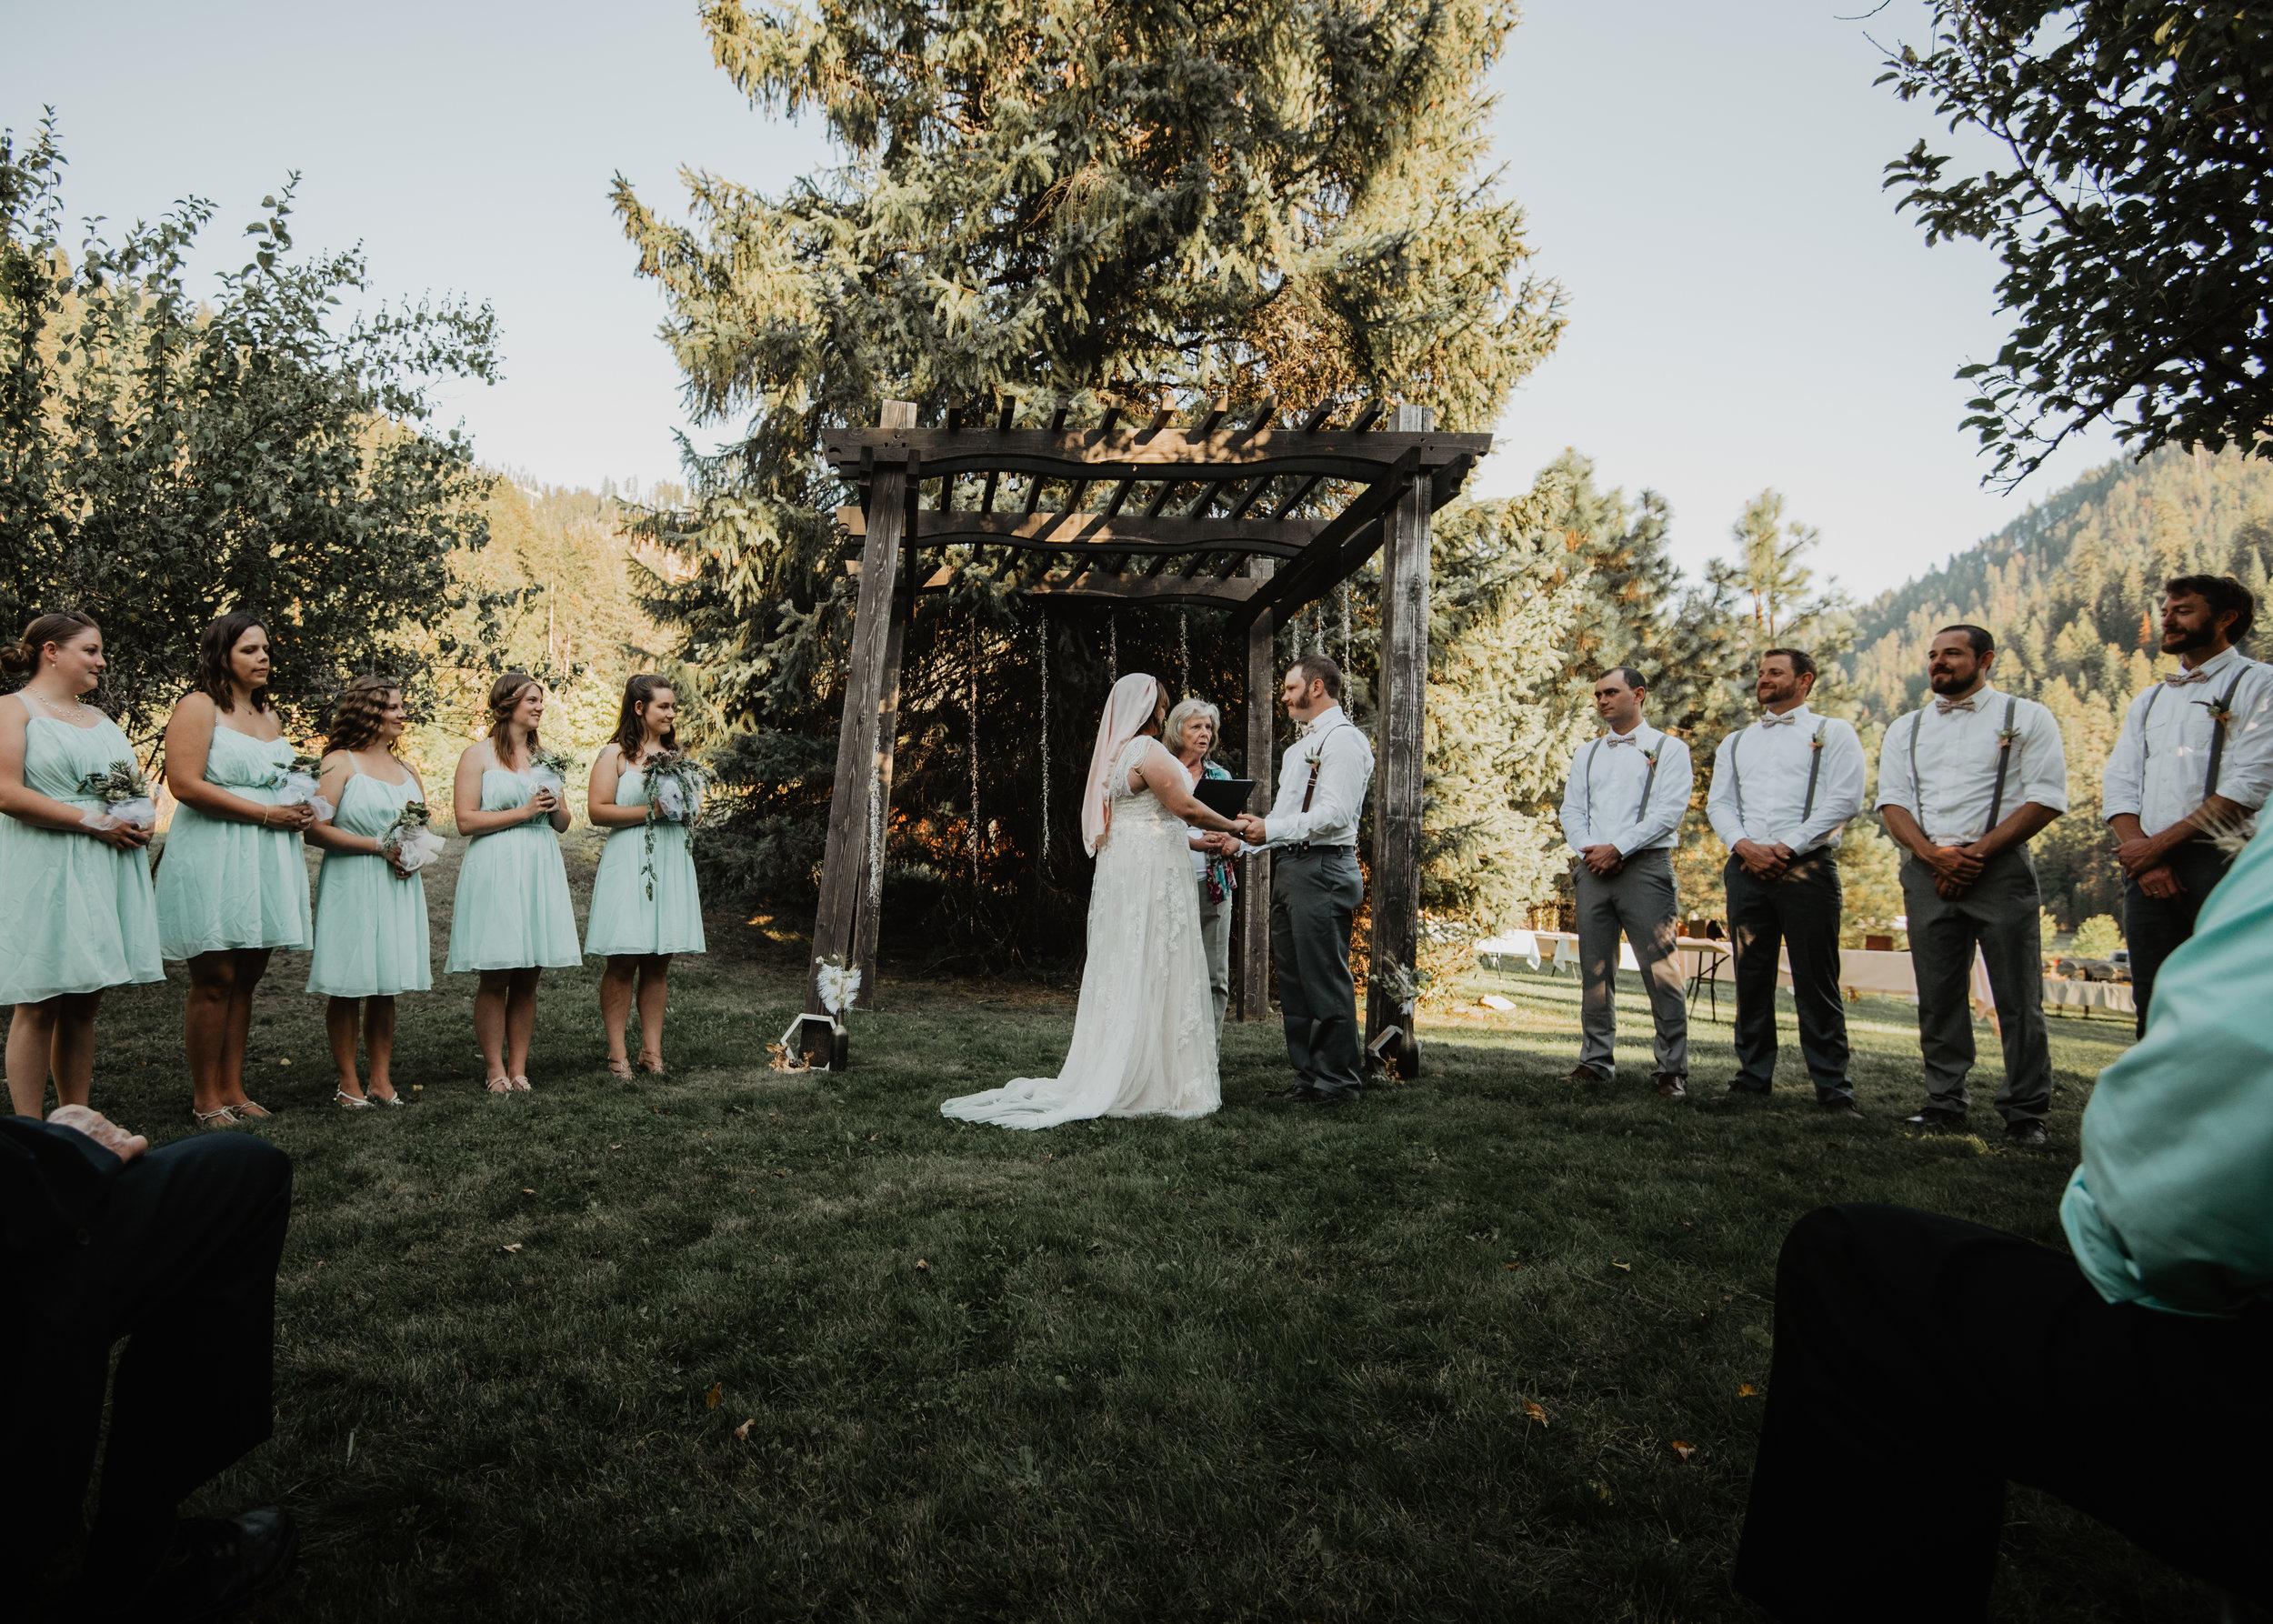 CT Wedding_Ceremony-49.jpg